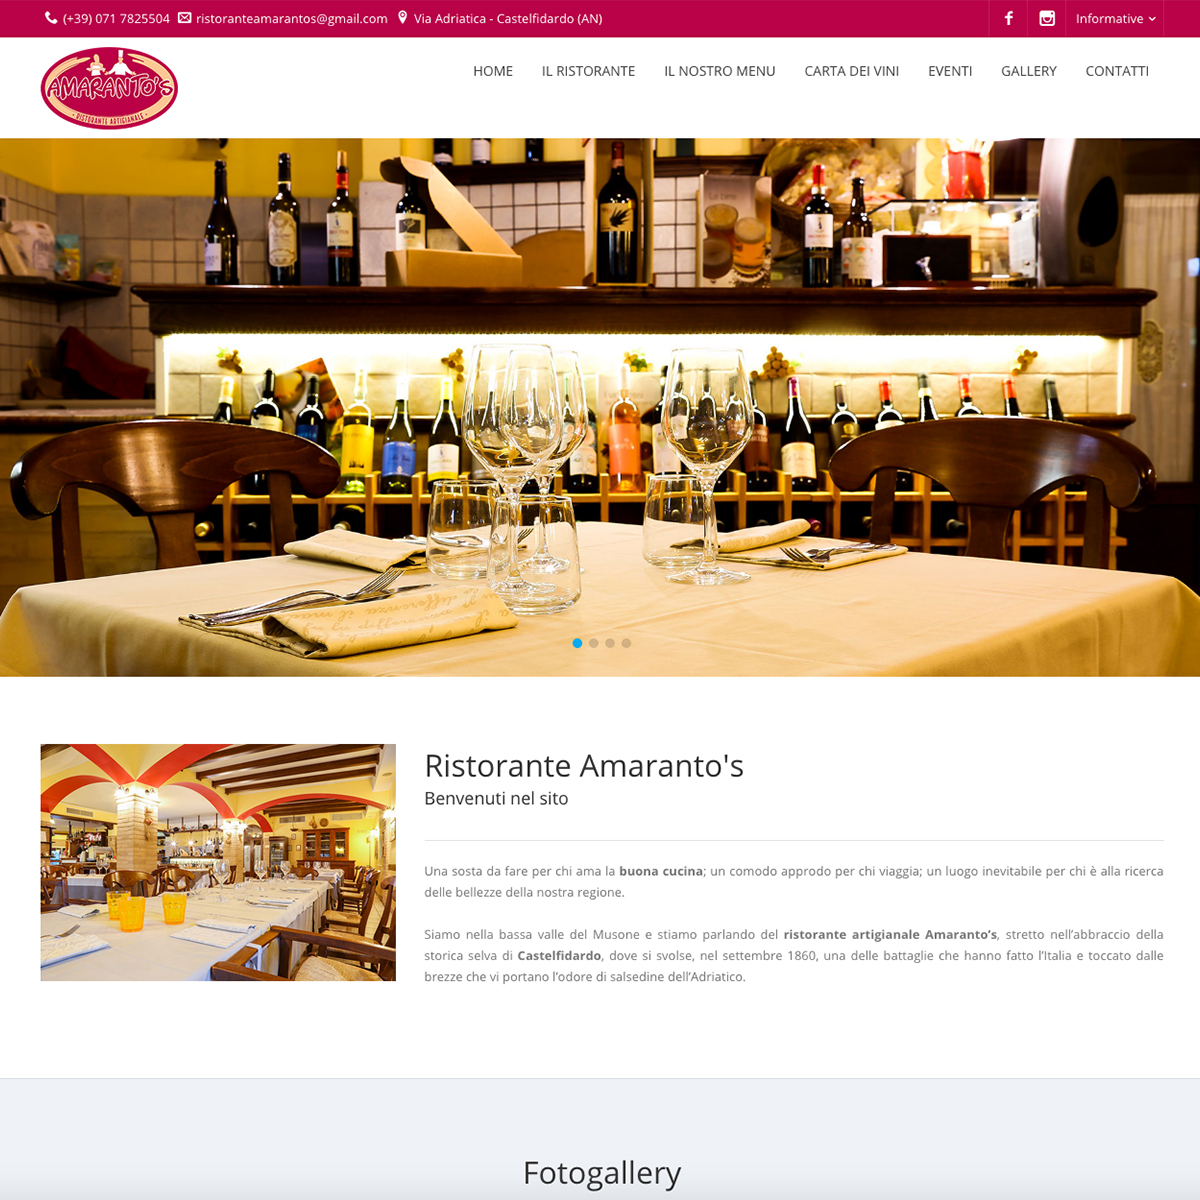 Ristorante Amaranto's